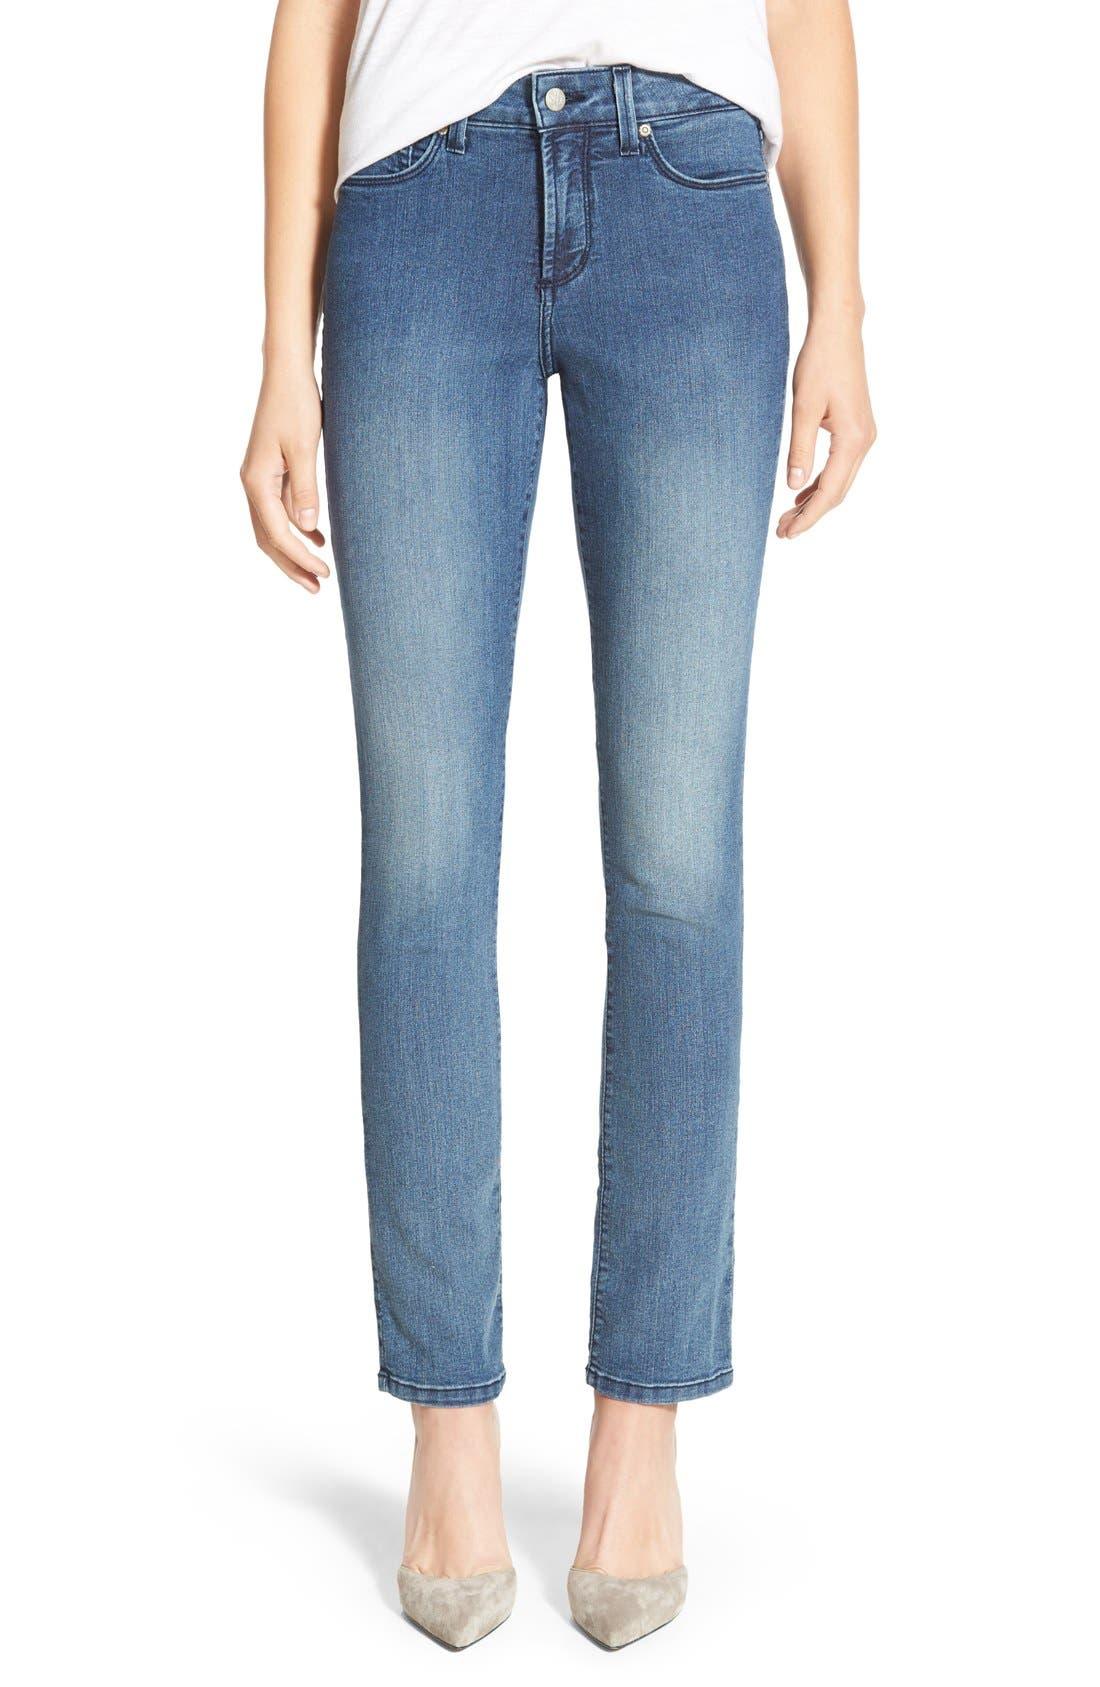 Main Image - NYDJ 'Sheri' Stretch Skinny Jeans (Karval) (Regular & Petite)